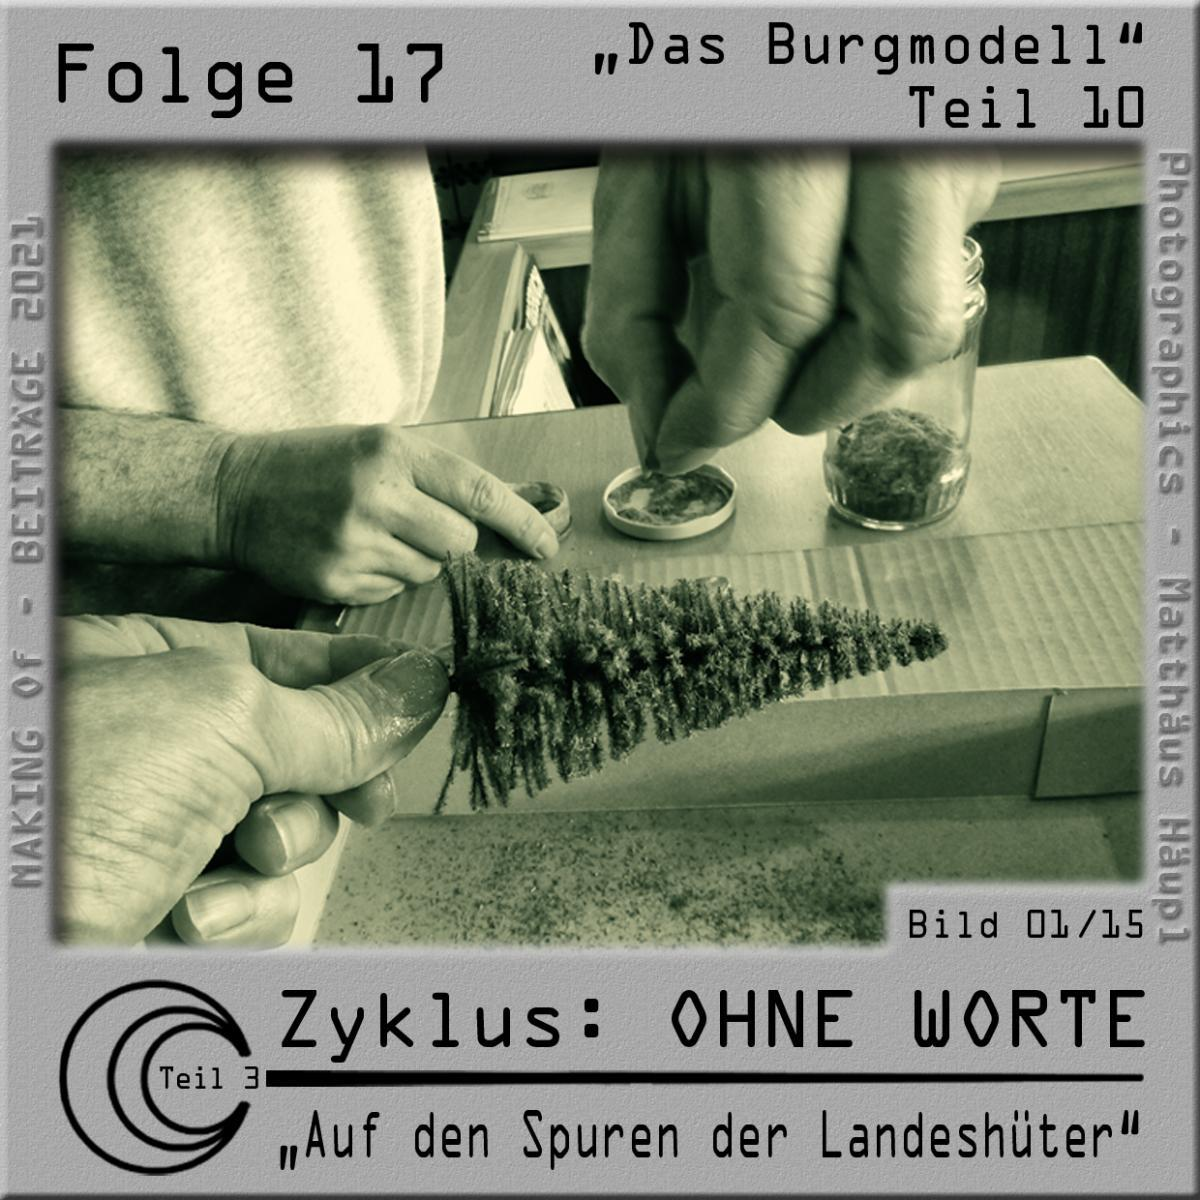 Folge-17 Das-Burgmodell Teil-10-01